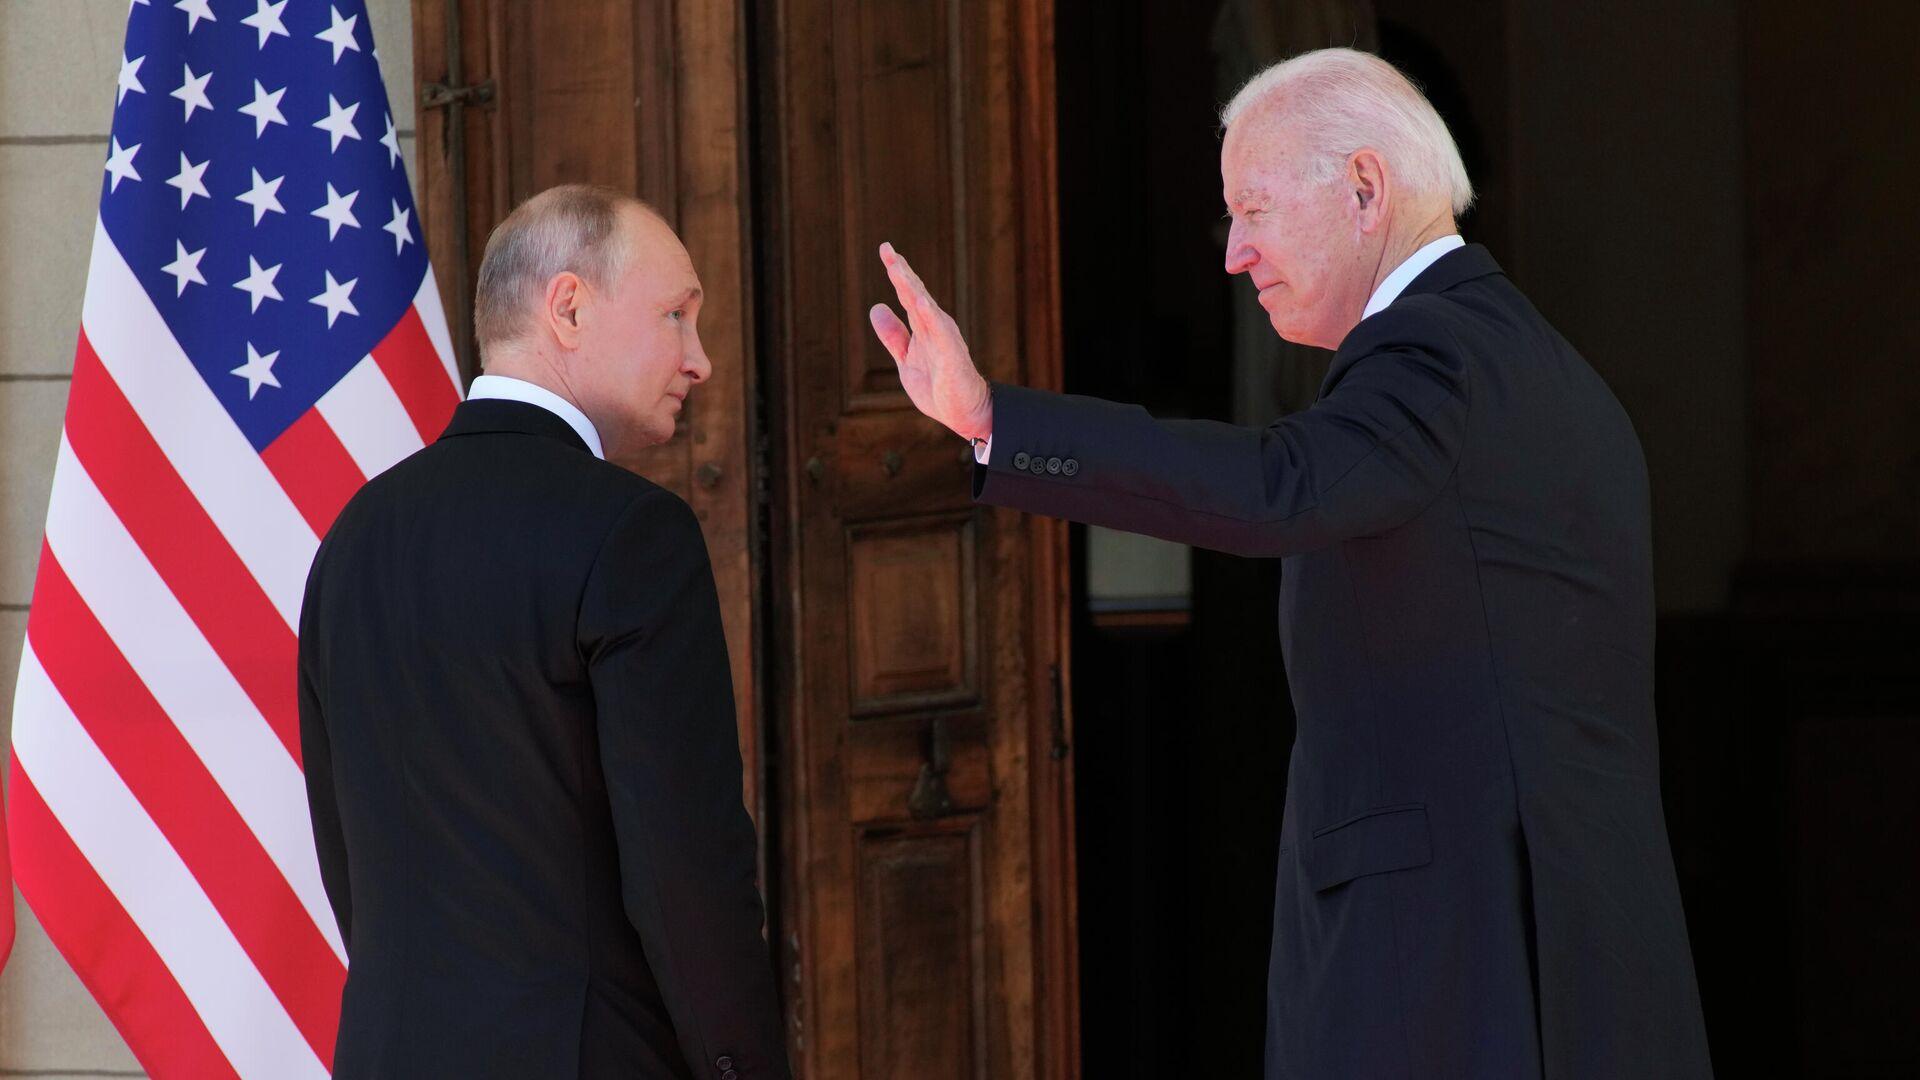 Президент РФ Владимир Путин и президент США Джо Байден во время встречи на вилле Ла Гранж в Женеве - РИА Новости, 1920, 28.07.2021